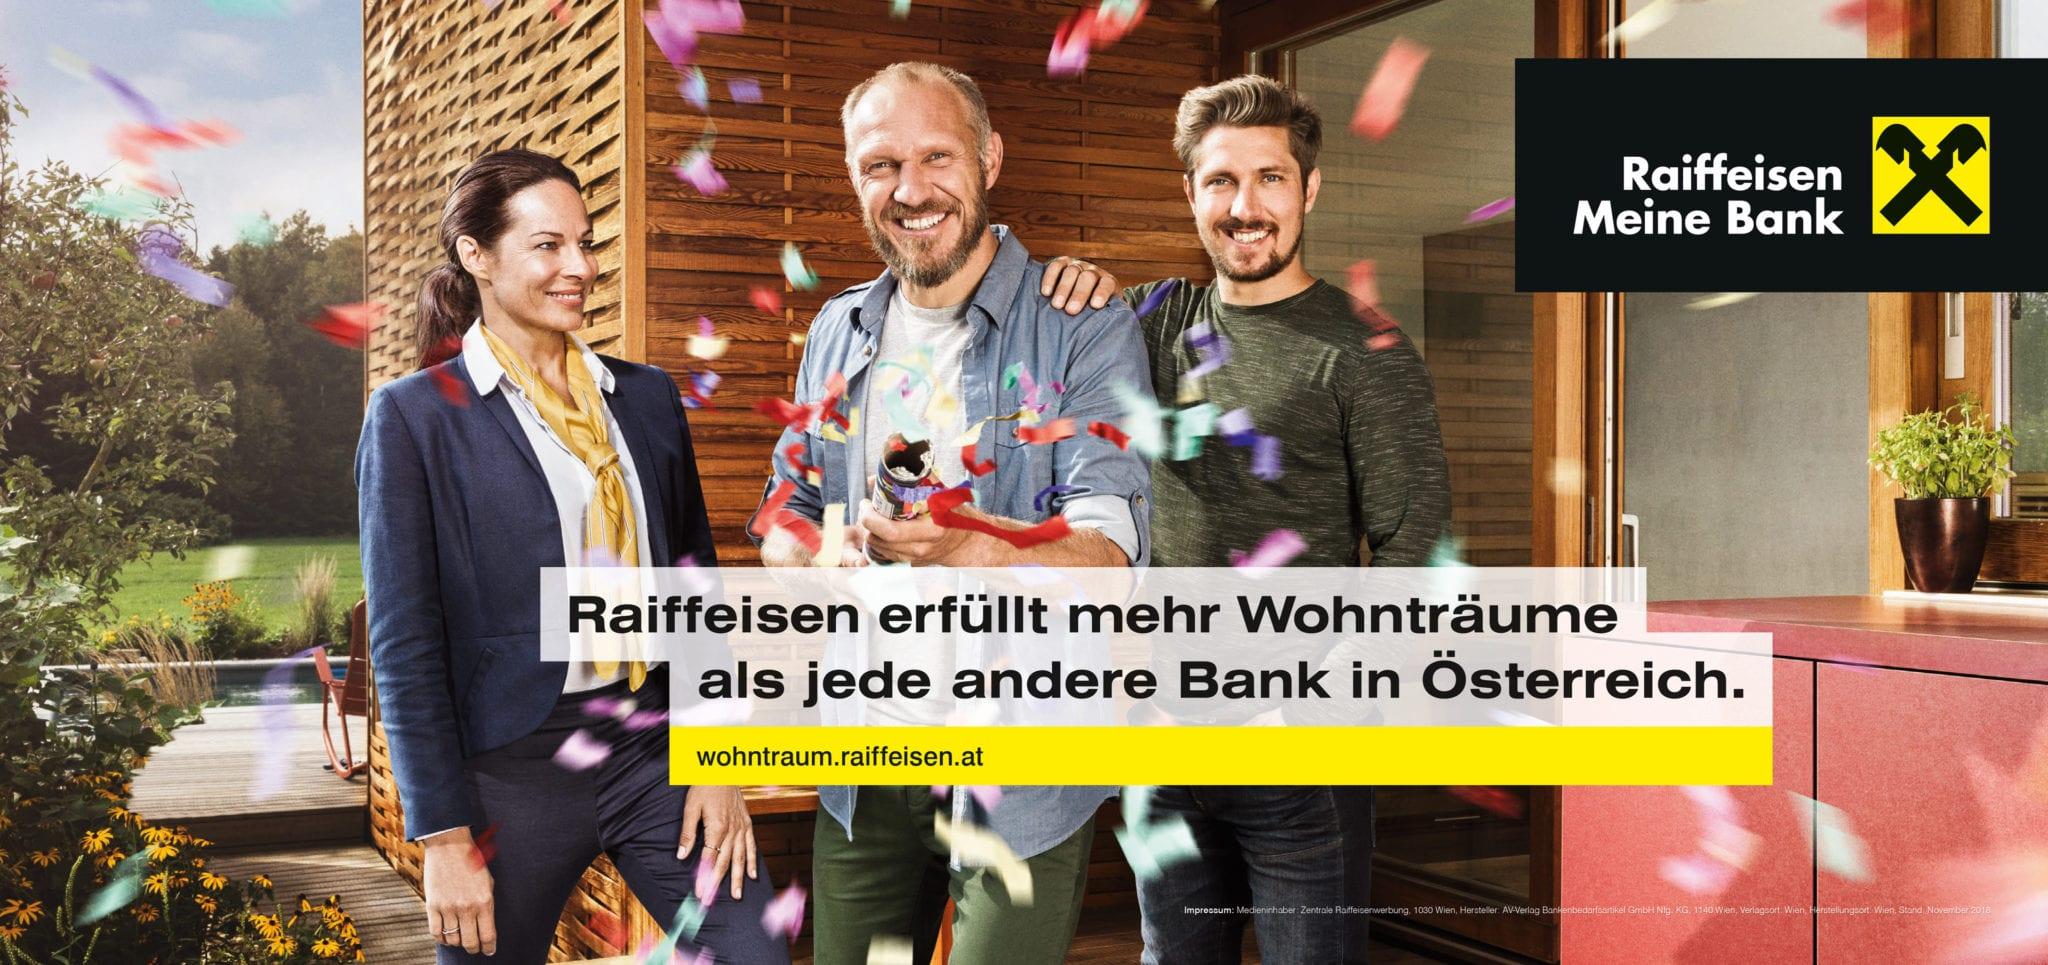 OGILVY - Marcus Hornek // Sebastian Kainz // Client: Raiffeisen // 2019